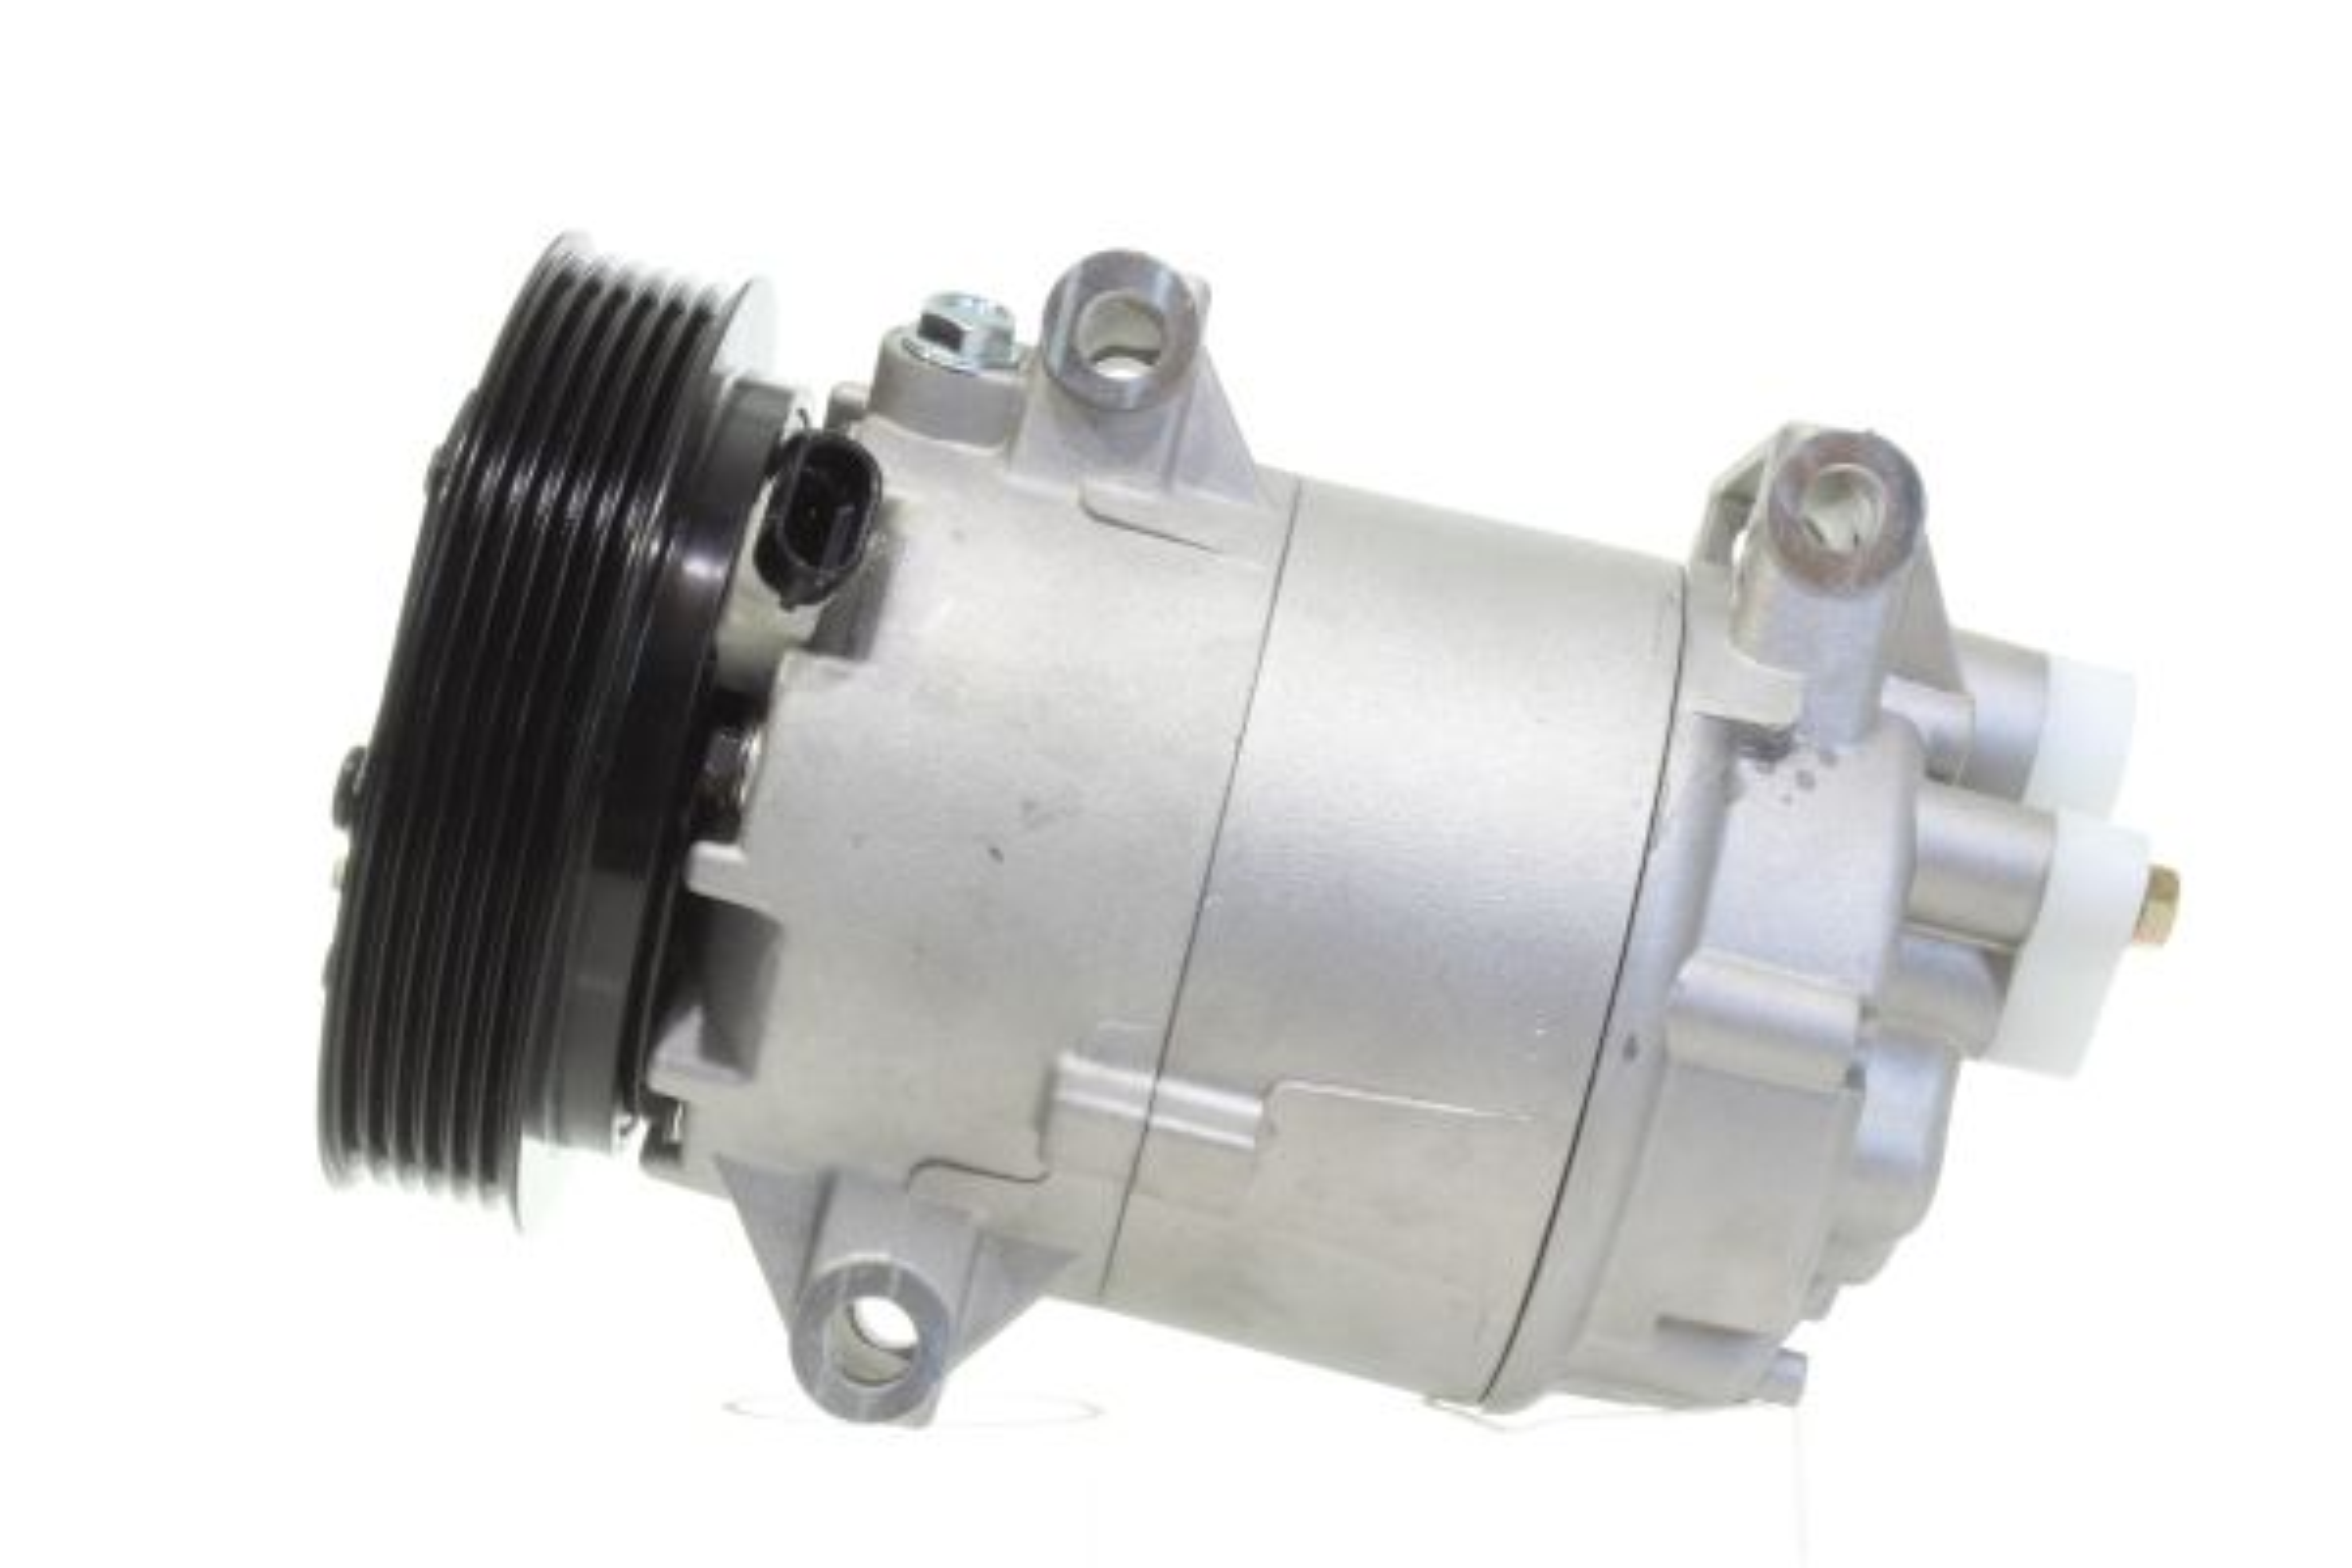 10550354 Kompressor ALANKO - Markenprodukte billig